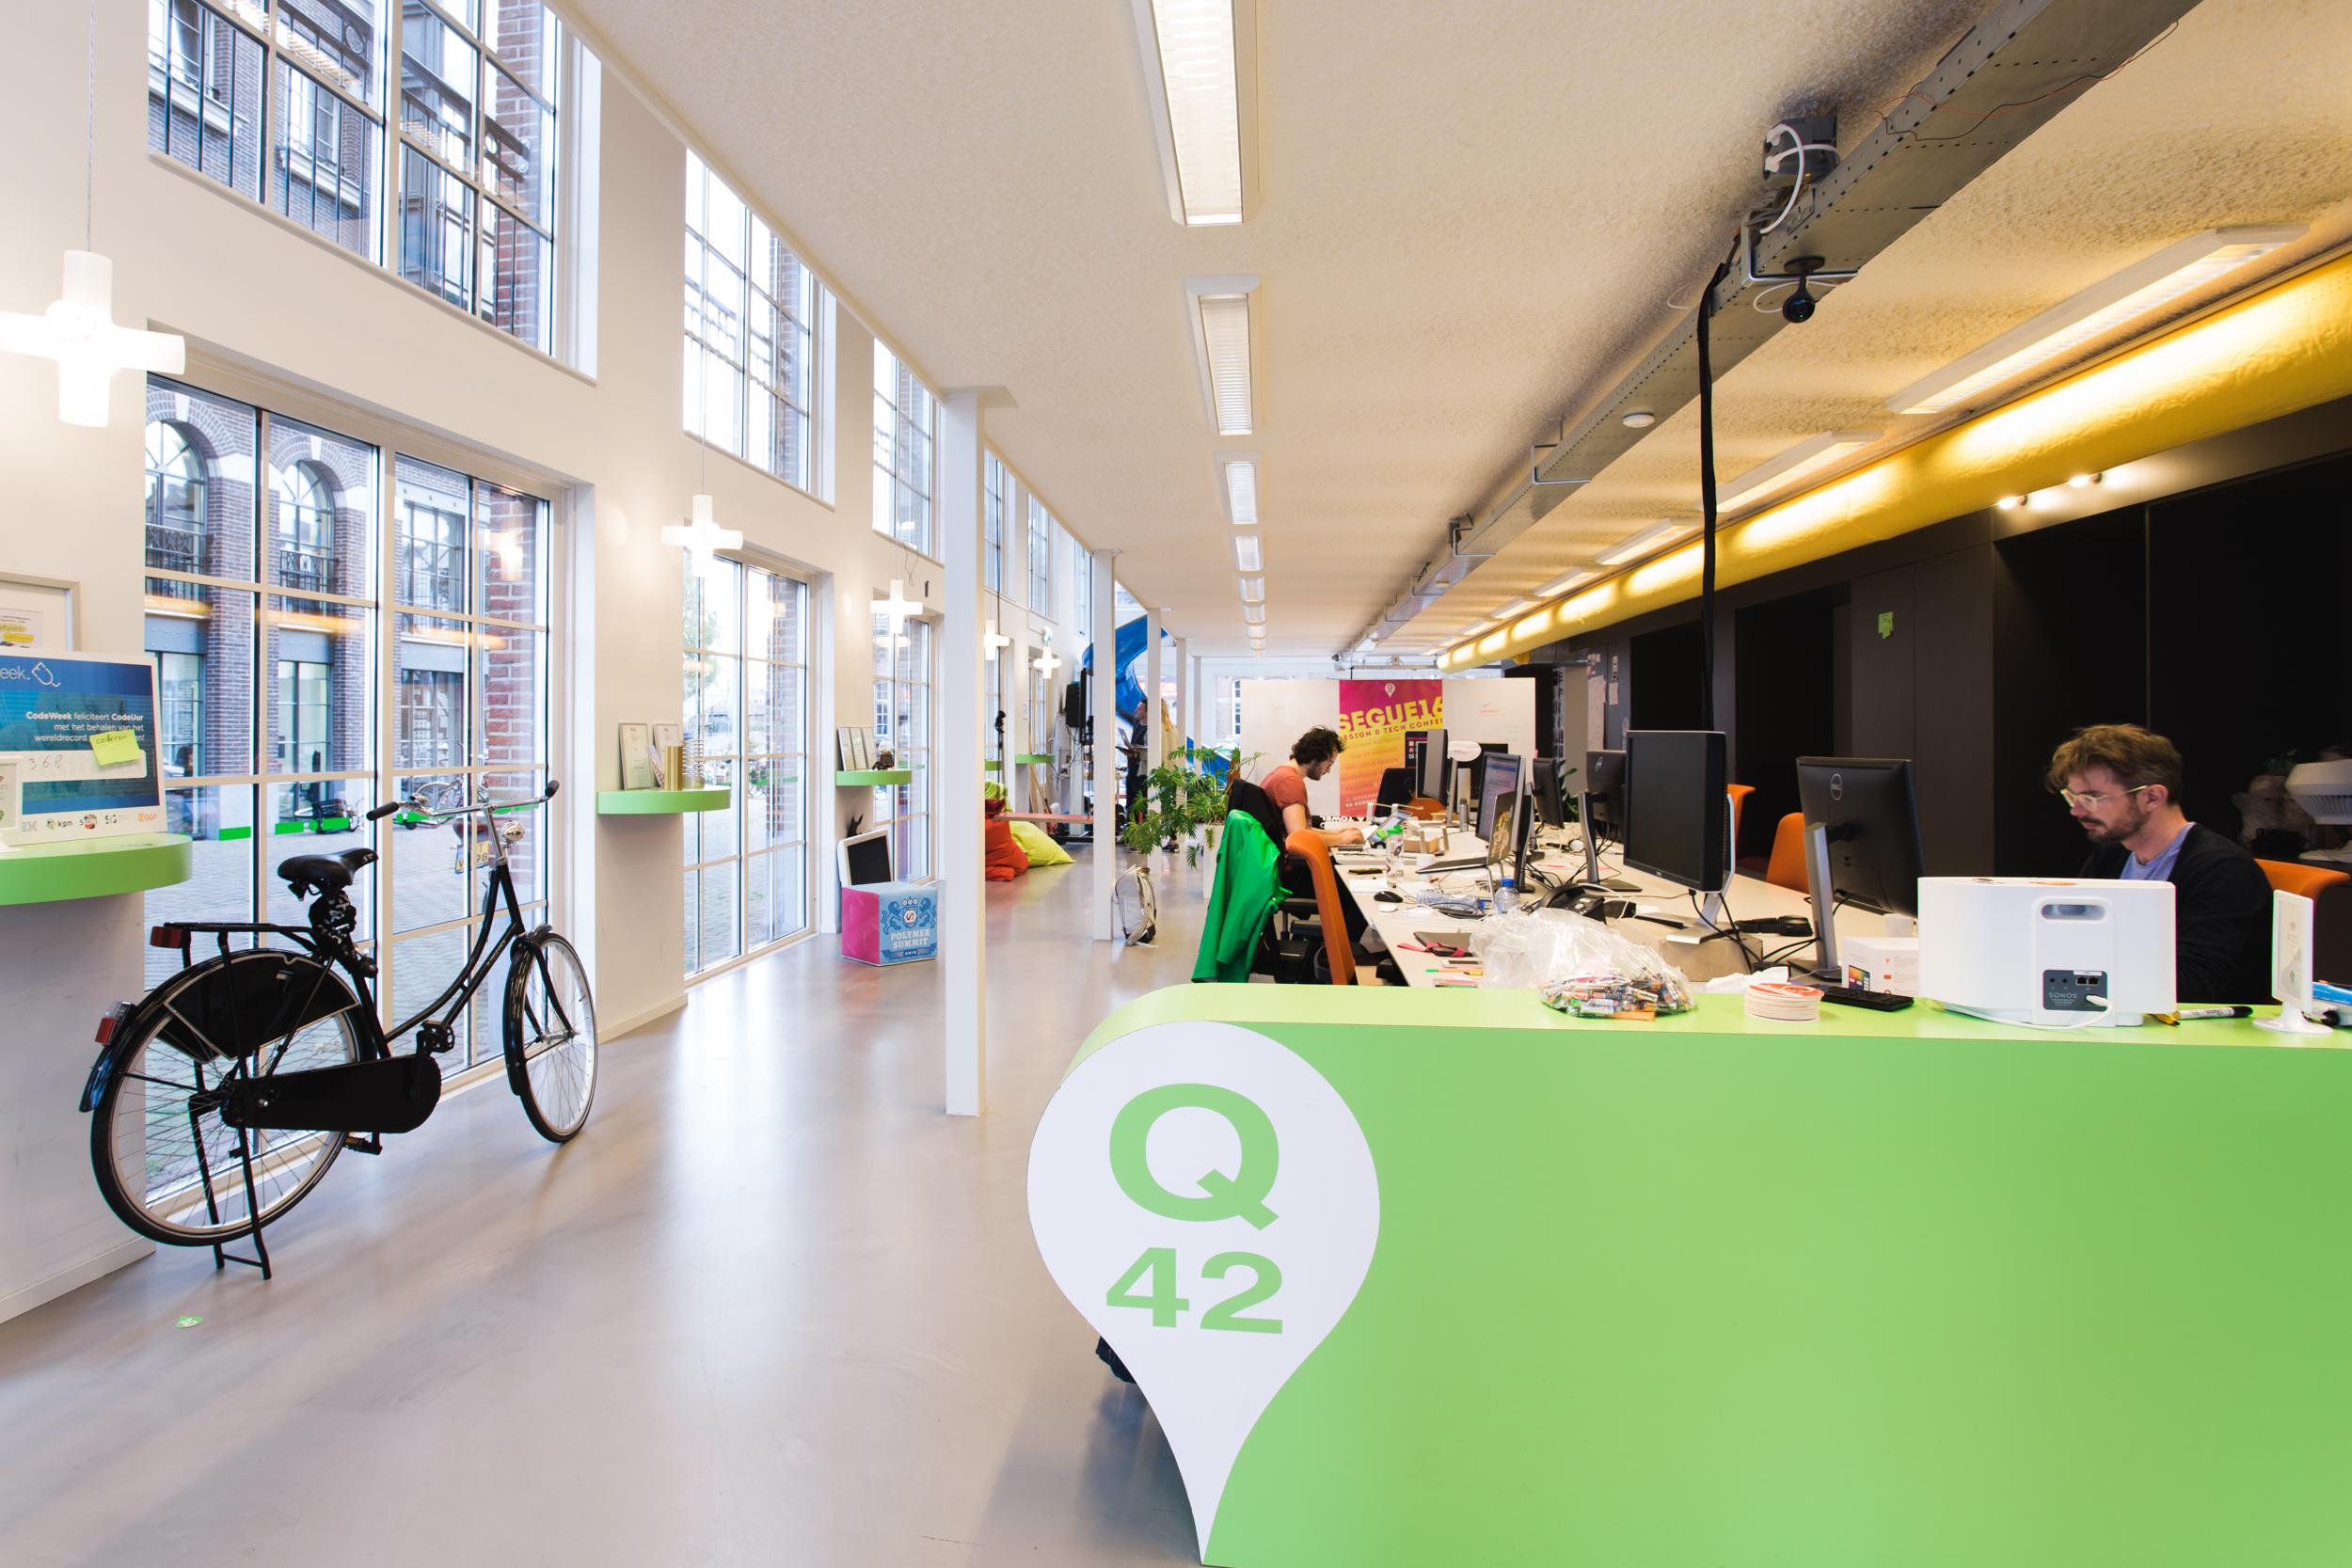 De mooiste kantoren van nederland q42 vance for Melchior interieur den haag